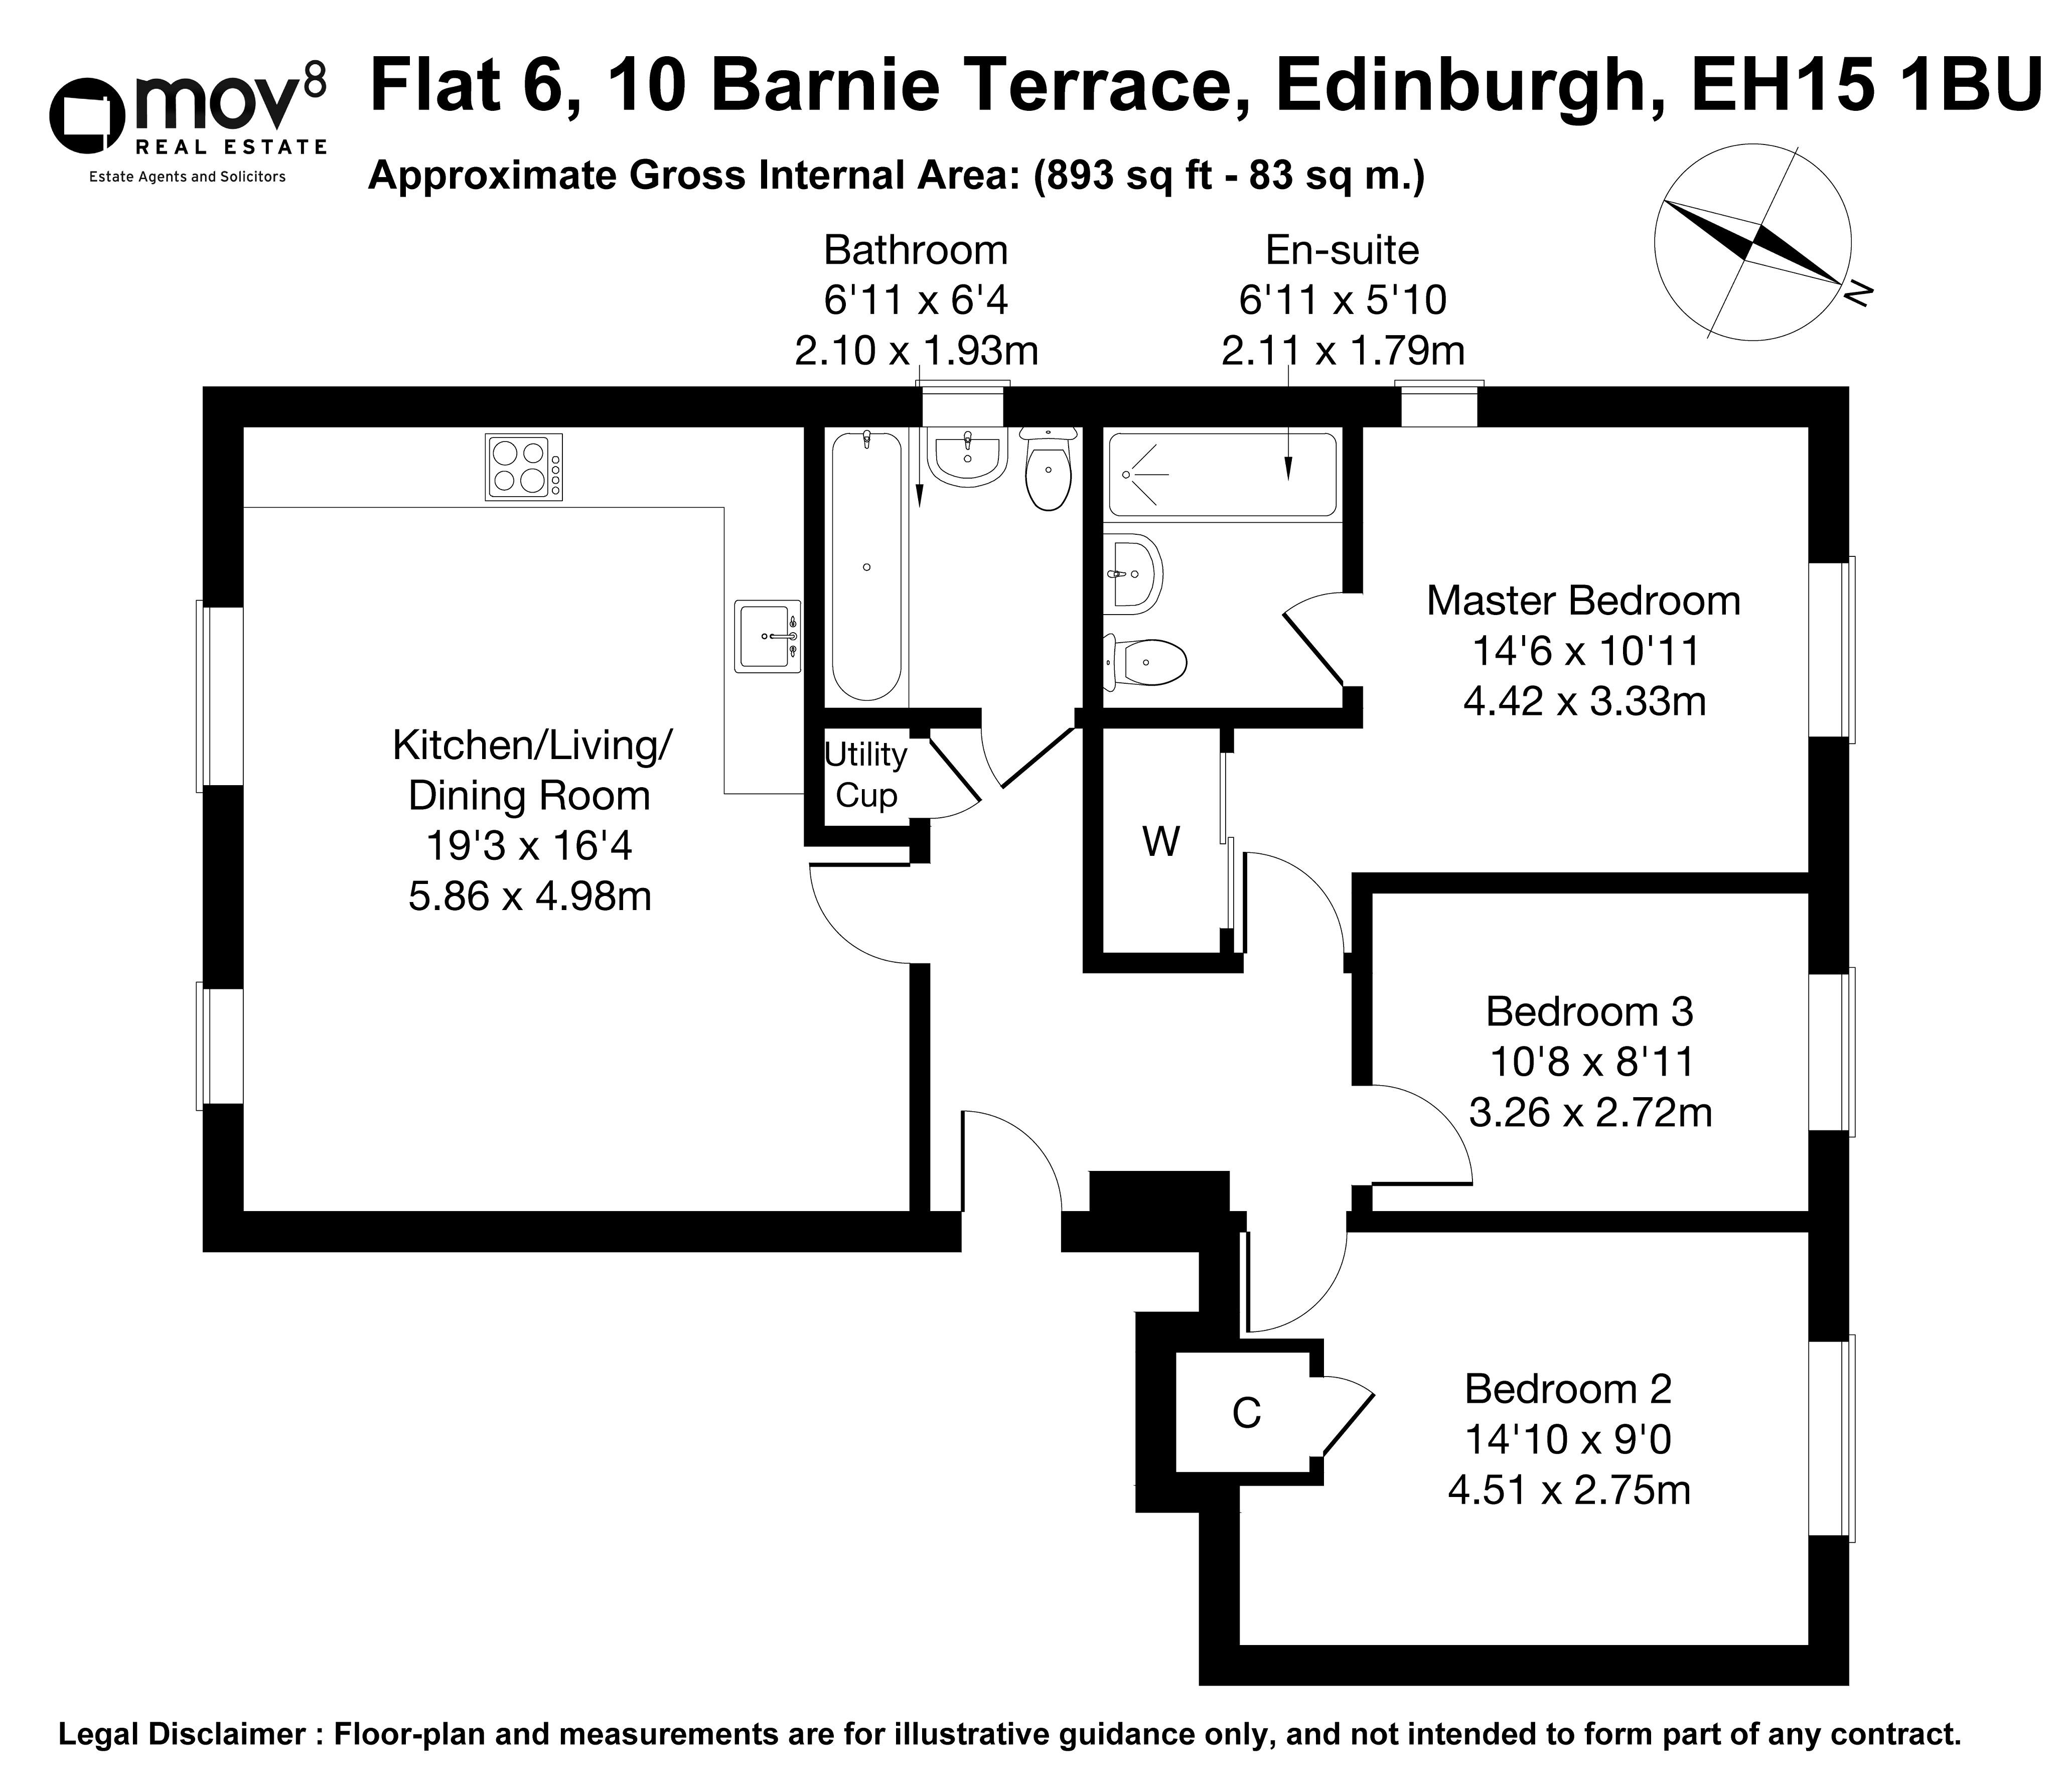 Floorplan 1 of Flat 6, 10 Barnie Terrace, Portobello, Edinburgh, Midlothian, EH15 1BU